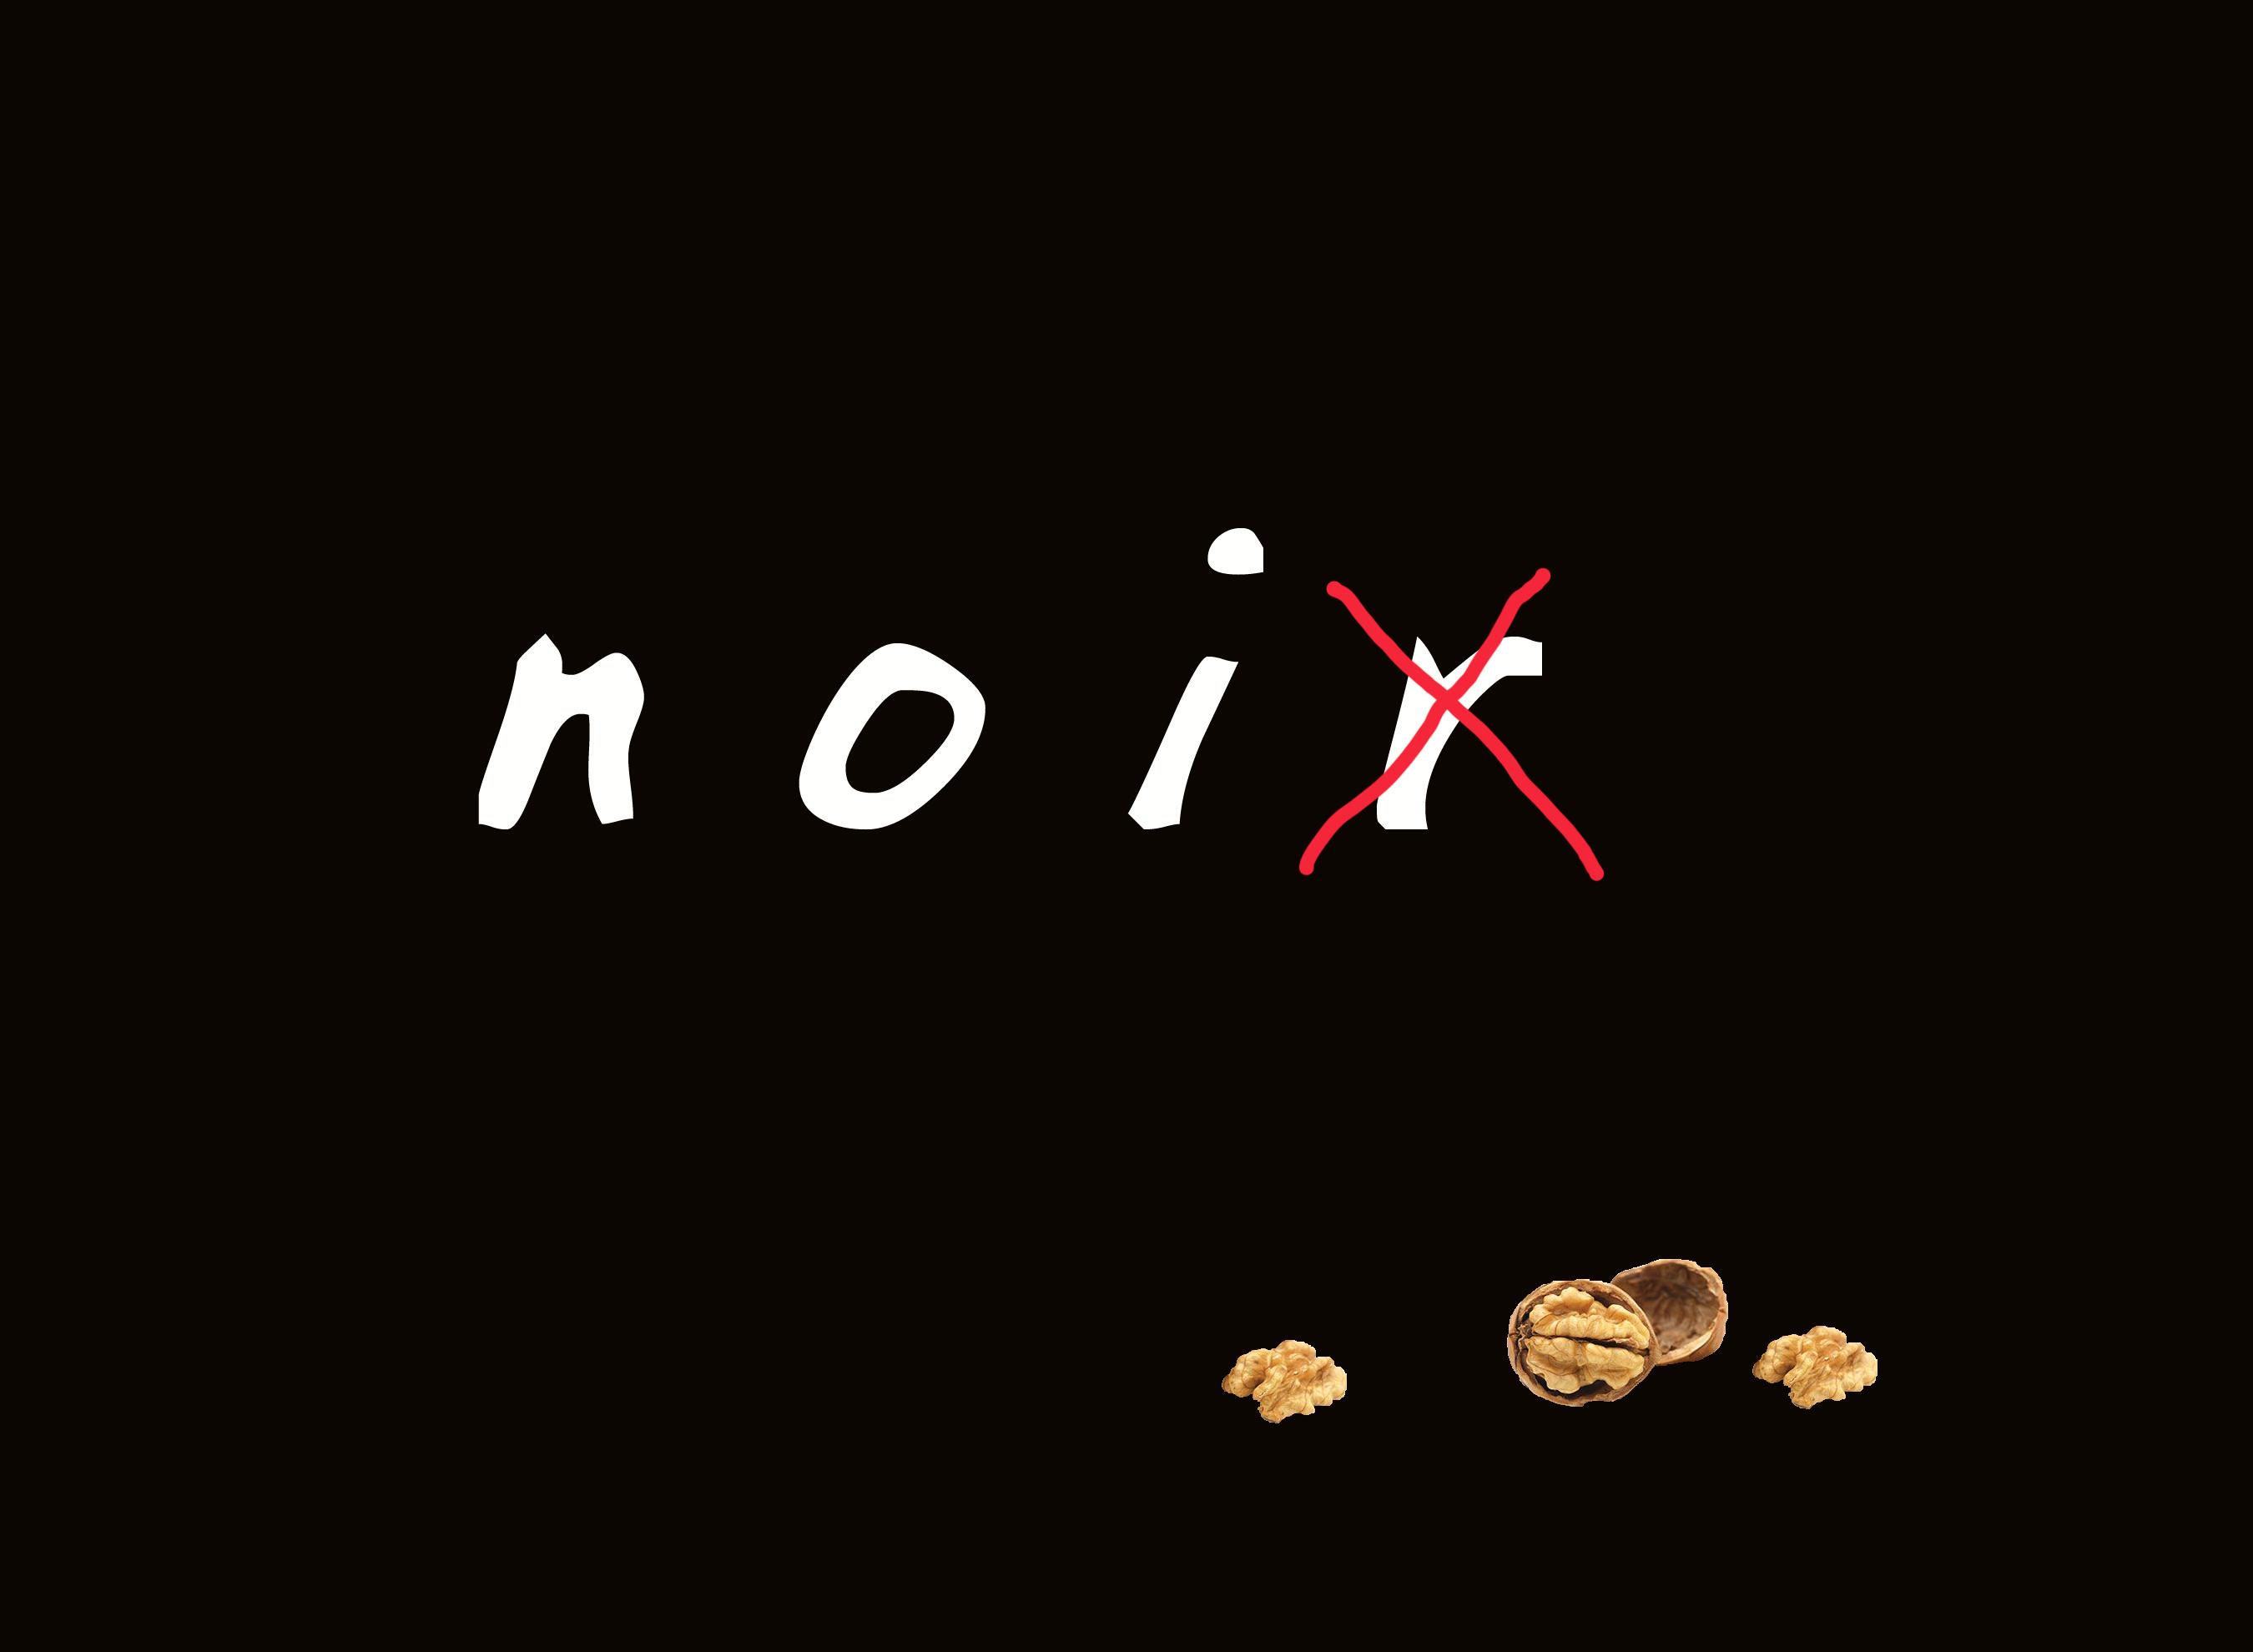 noix noir words and letters